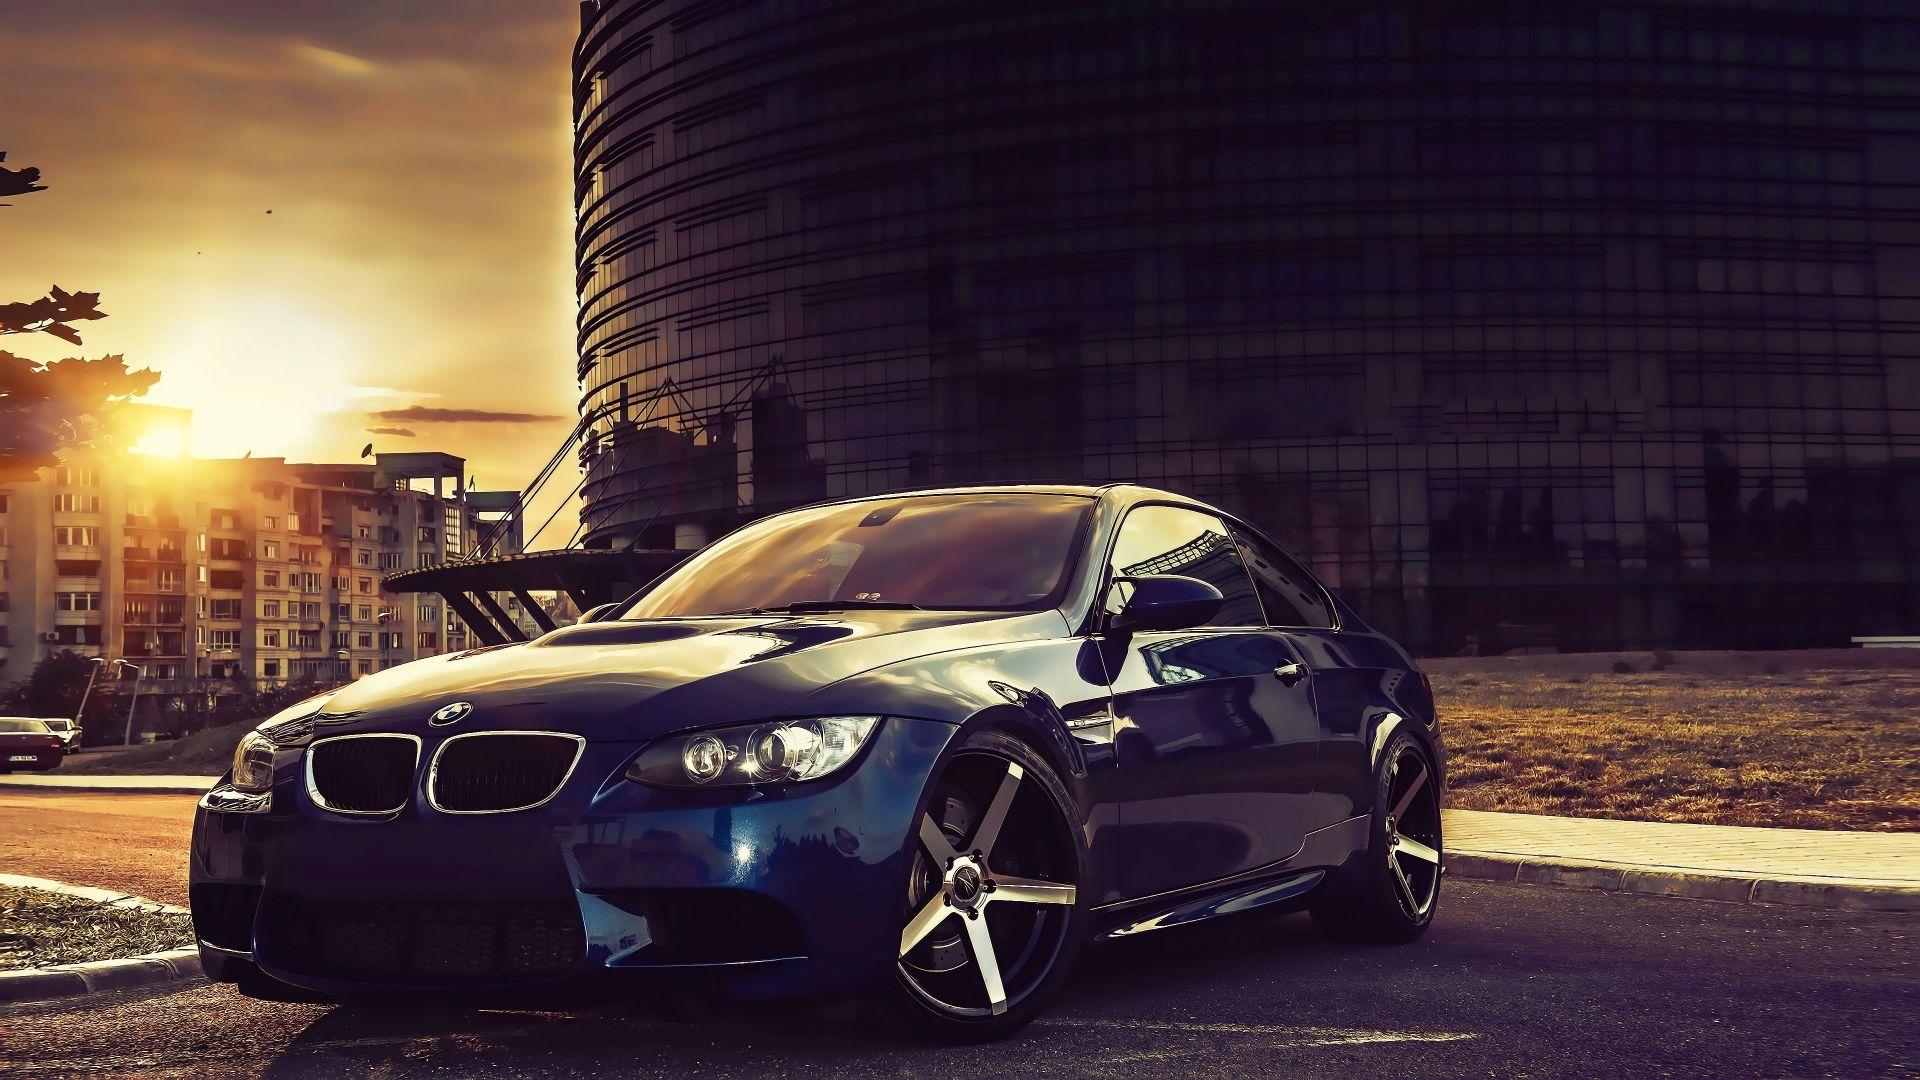 Desktop Wallpaper Bmw, Luxury Car, 4k, Hd Image, Picture ...